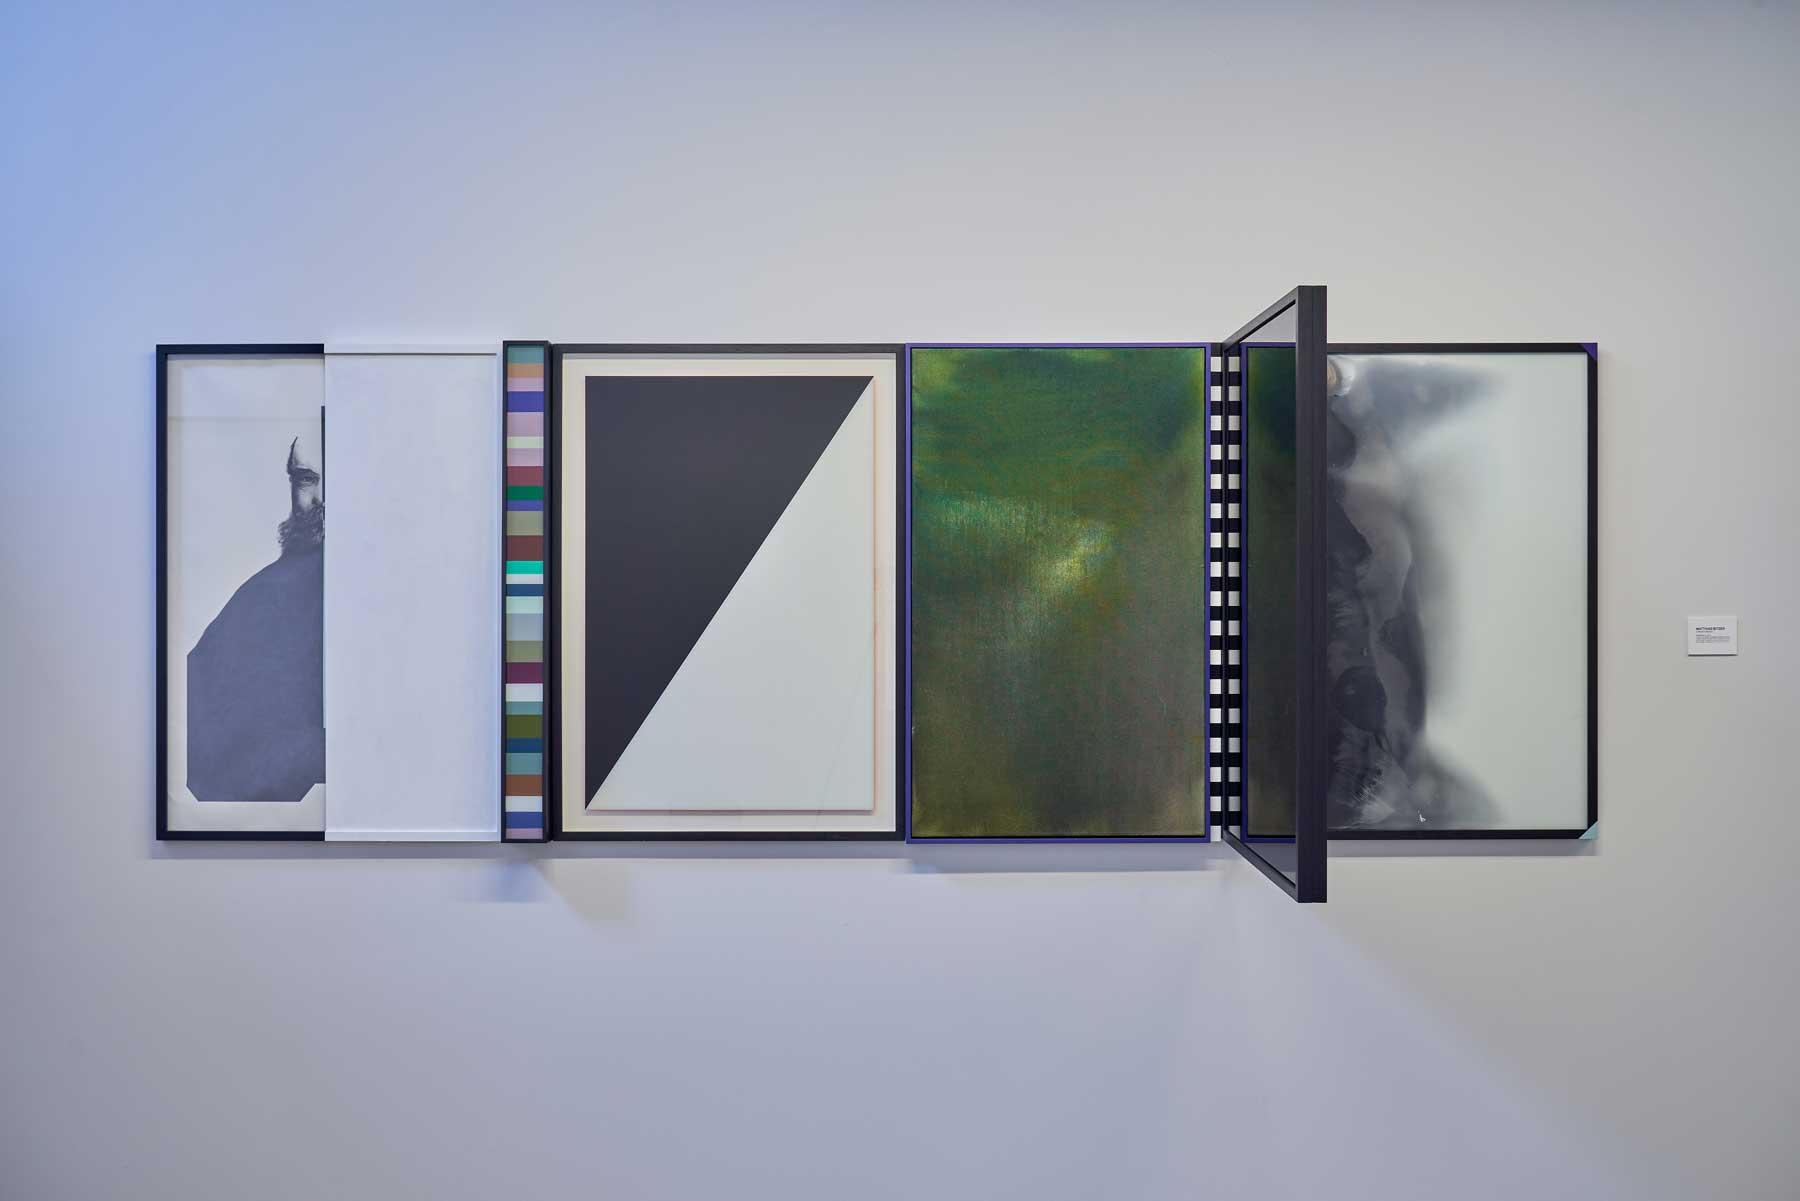 "Juliana Cerqueira Leite ,  Urn 1 , 2018, Hydrocal, FGR-95 plaster, glass fiber, steel, burlap, clay, pigment, 61"" x 29"" x 25"" (154,9 x 73,7 x 63,5 cm) (Detail)"